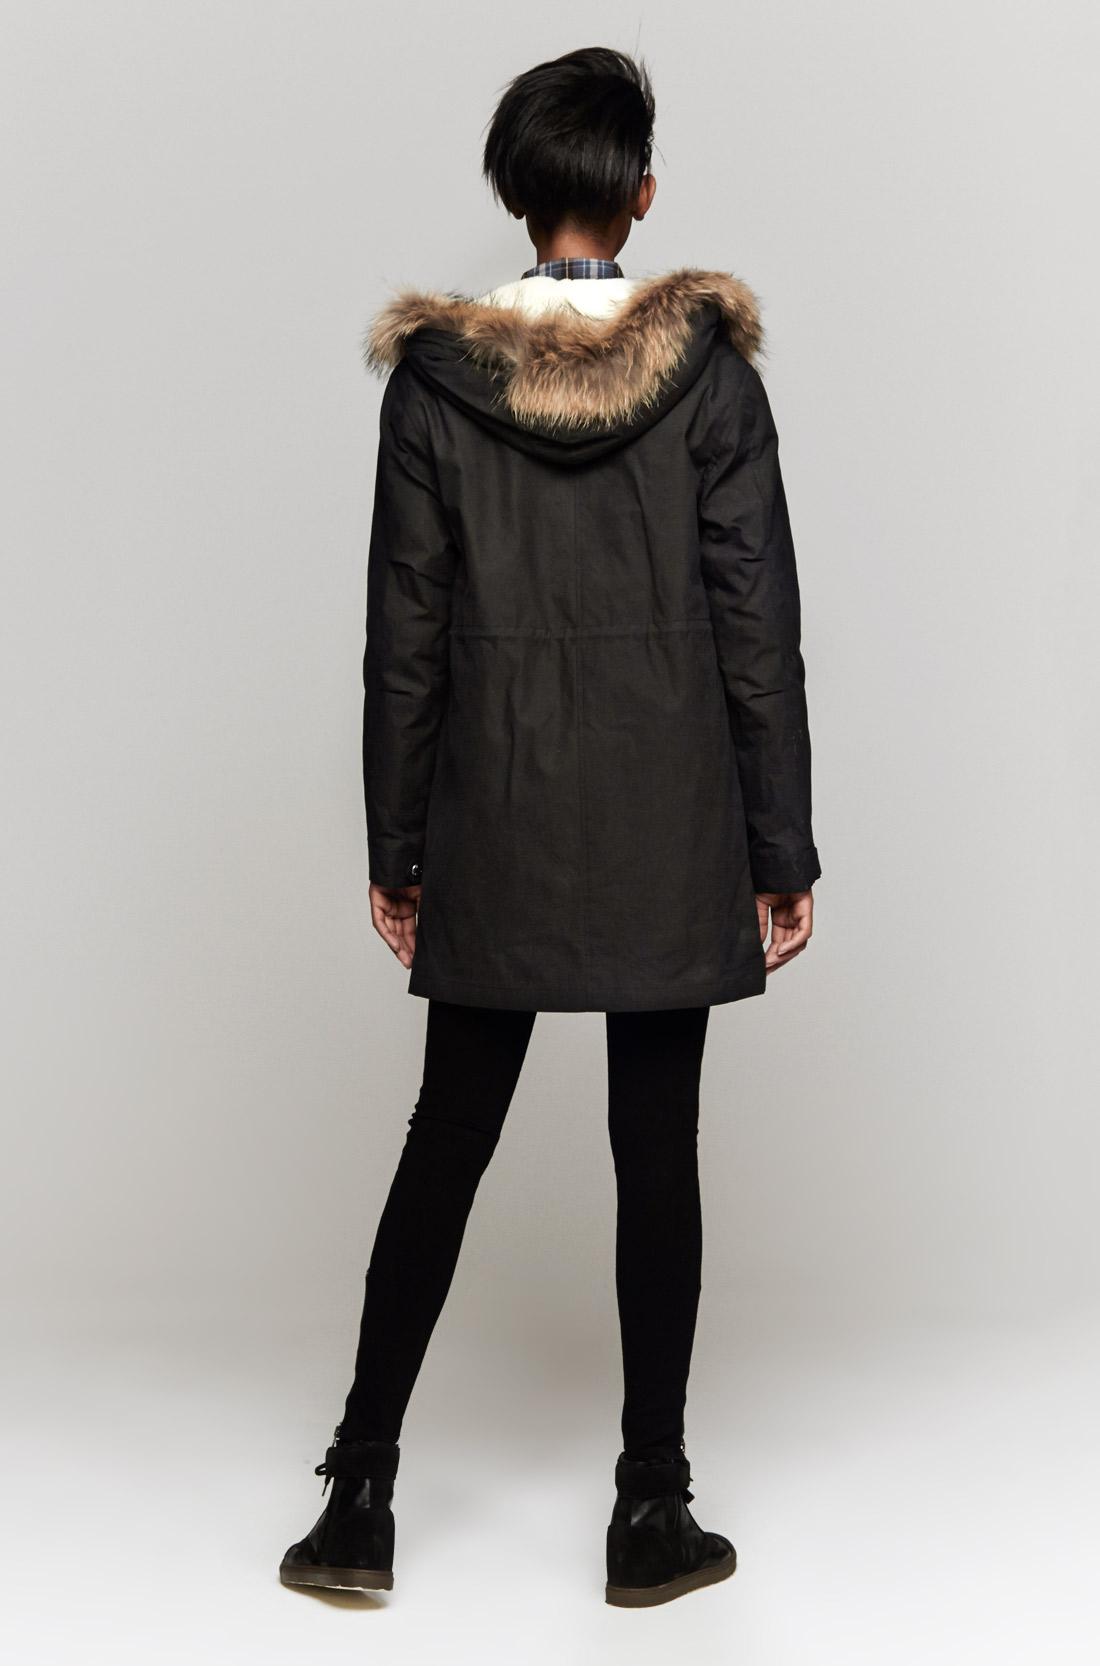 Lyst - A.P.C. Winter Parka in Black 5027567eaed5